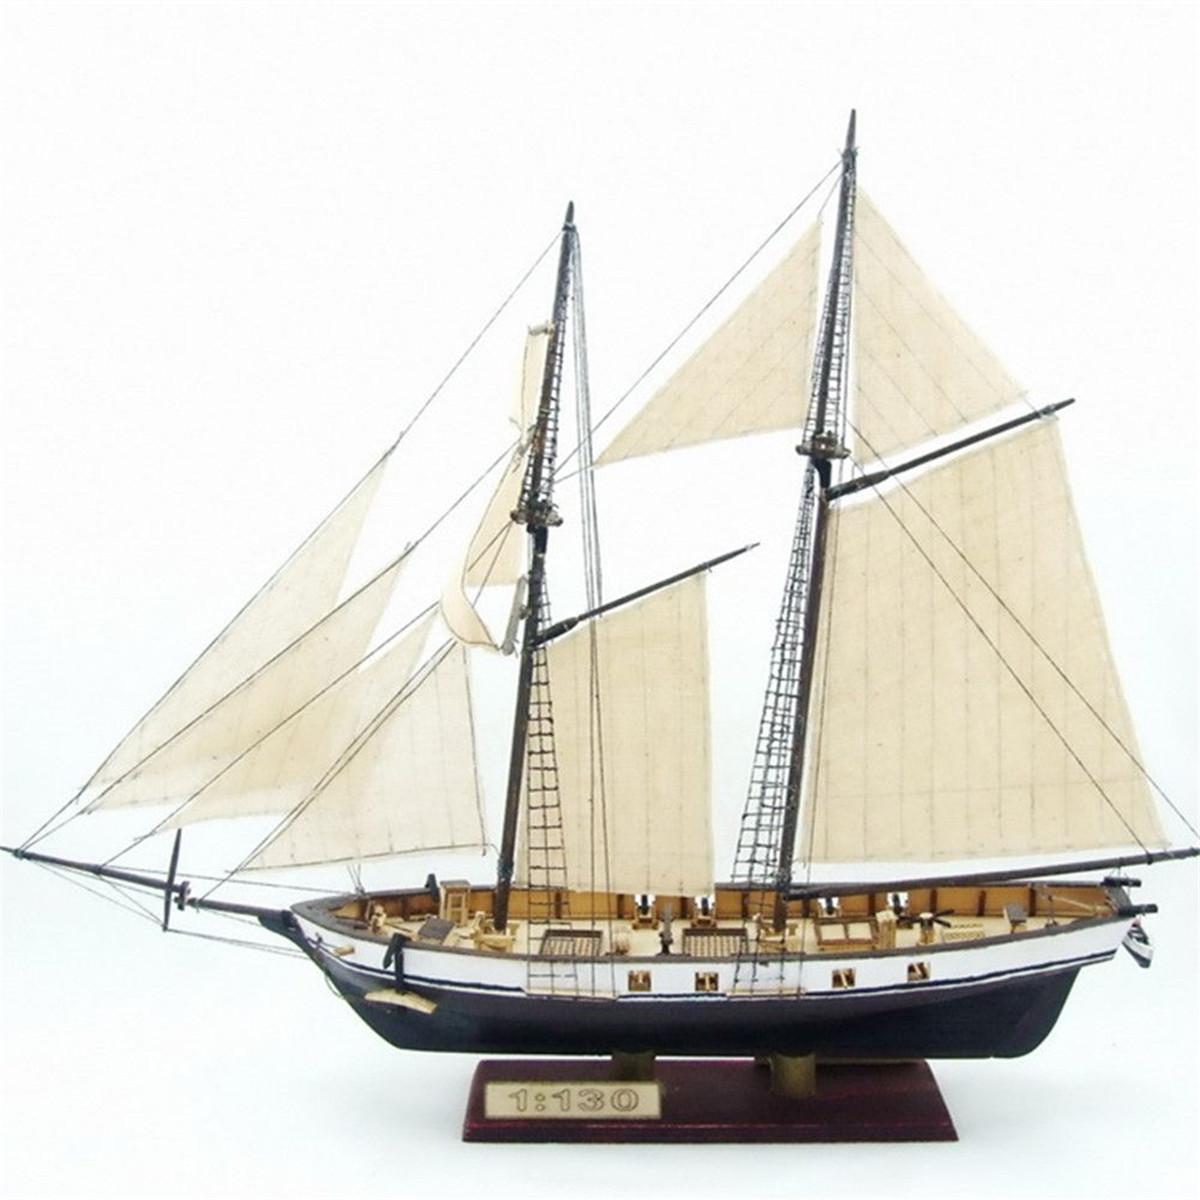 380x130x270mm DIY Ship Assembly Model Kits Classical Wo